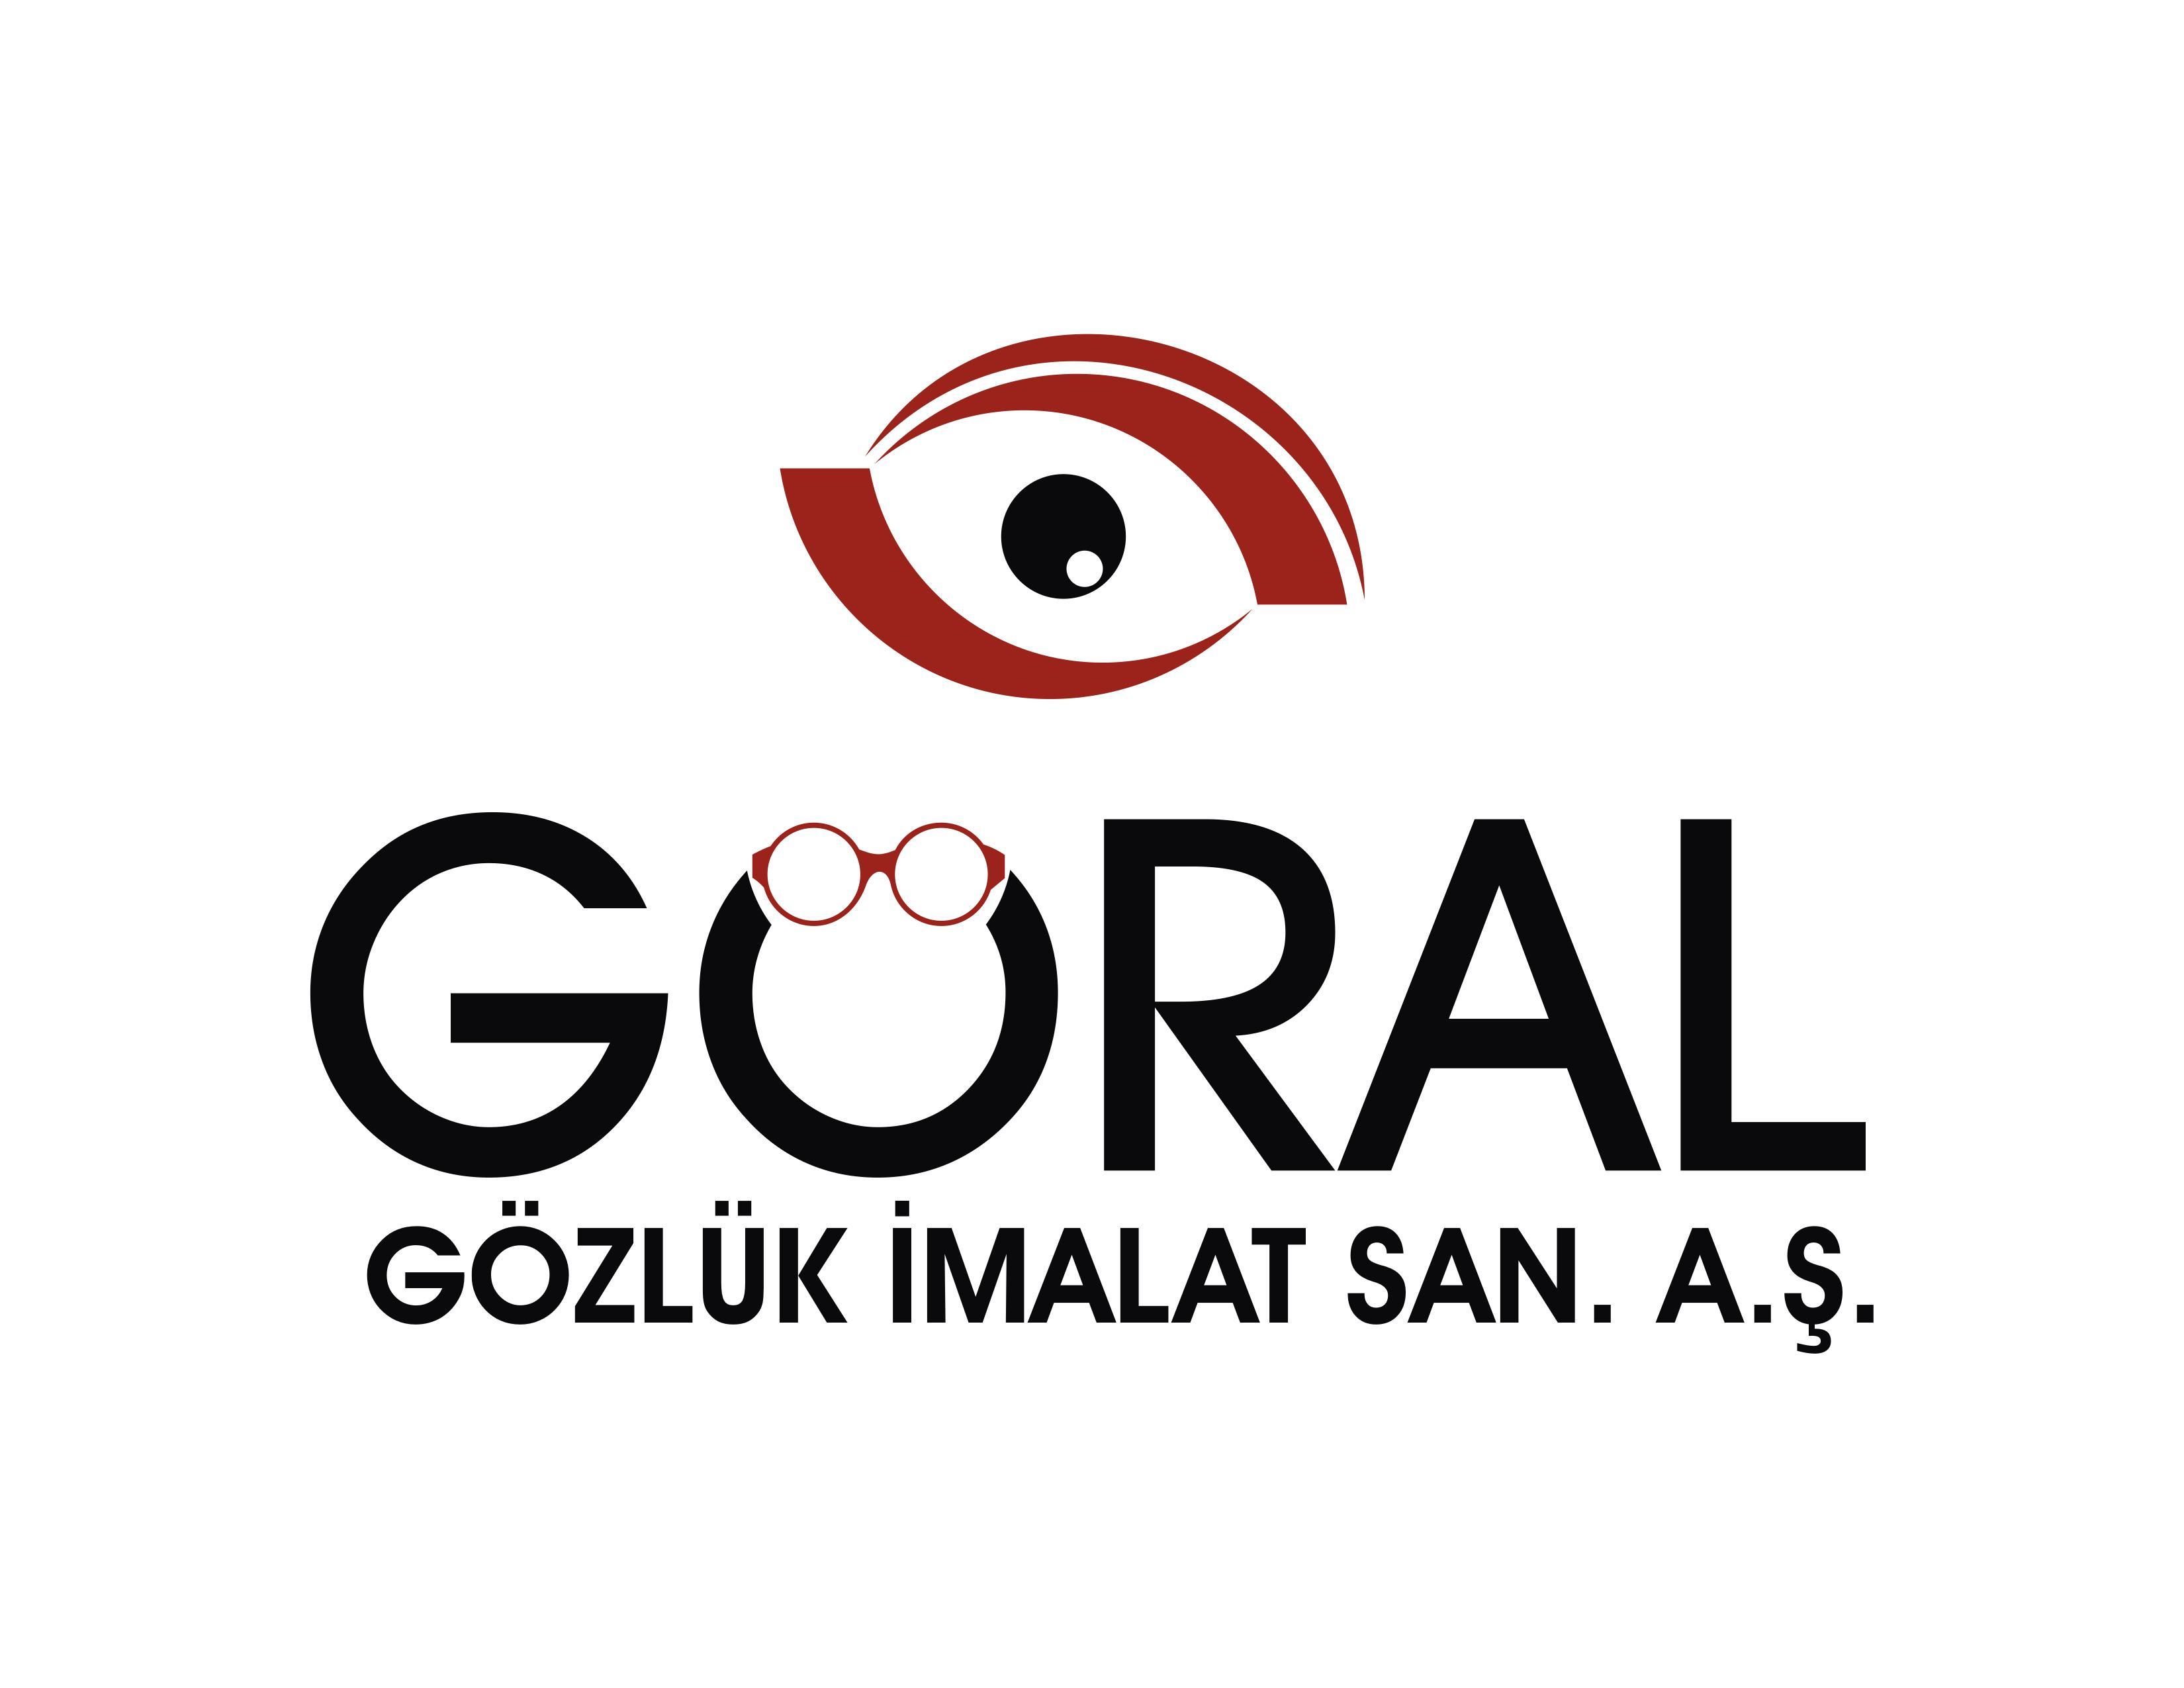 https://wwwi.globalpiyasa.com/lib/logo/94190/4ca8aa2983090916686291a5ad73721d.jpg